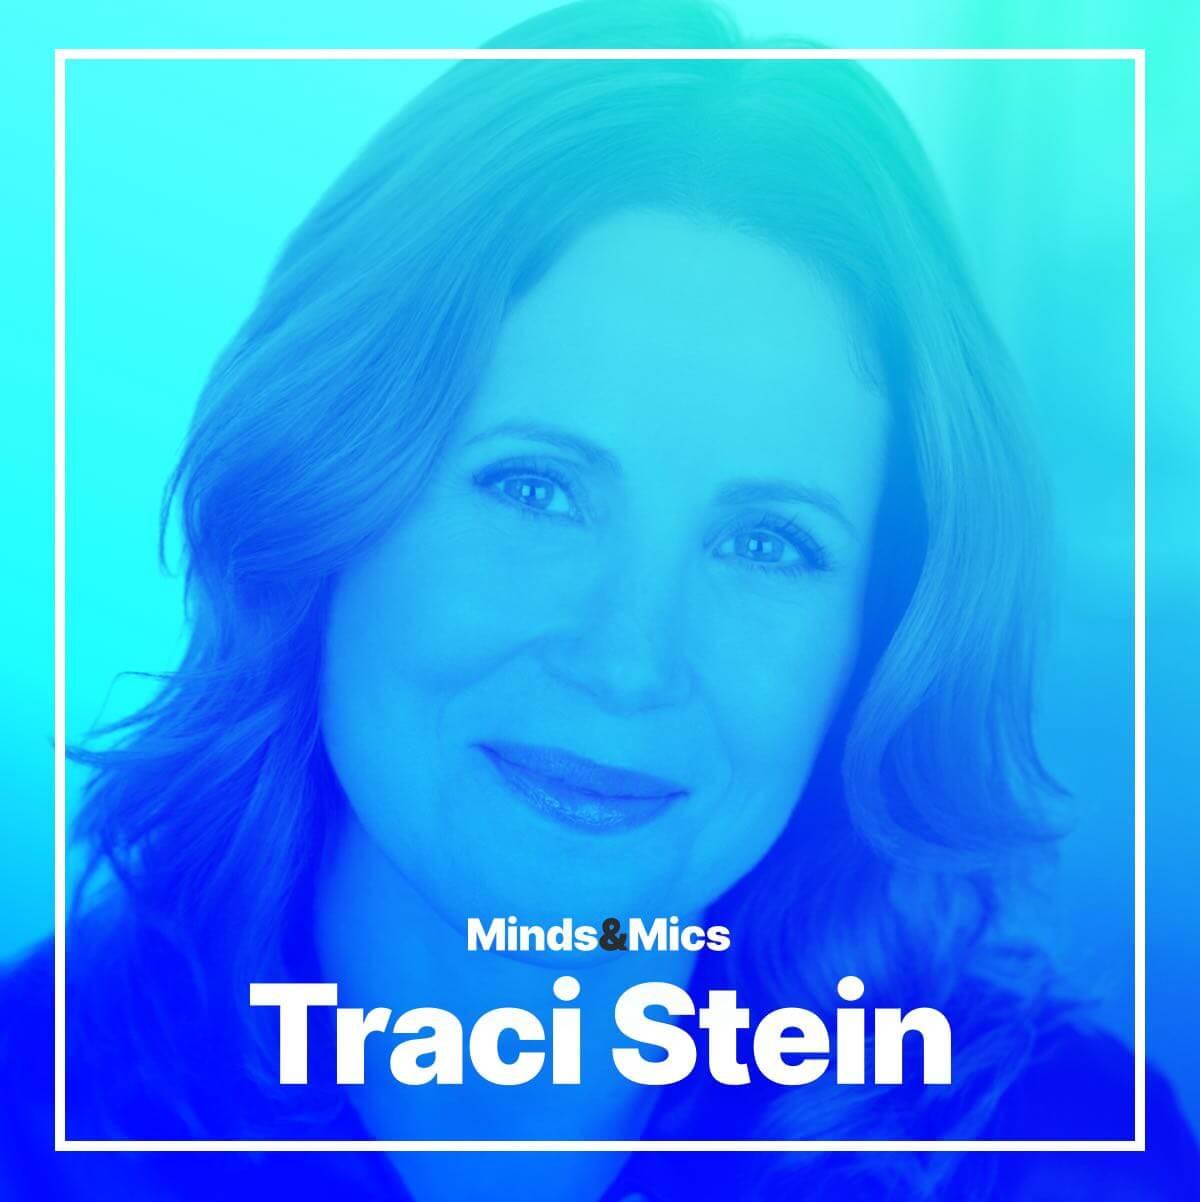 Traci Stein Photo Minds and Mics Wignall